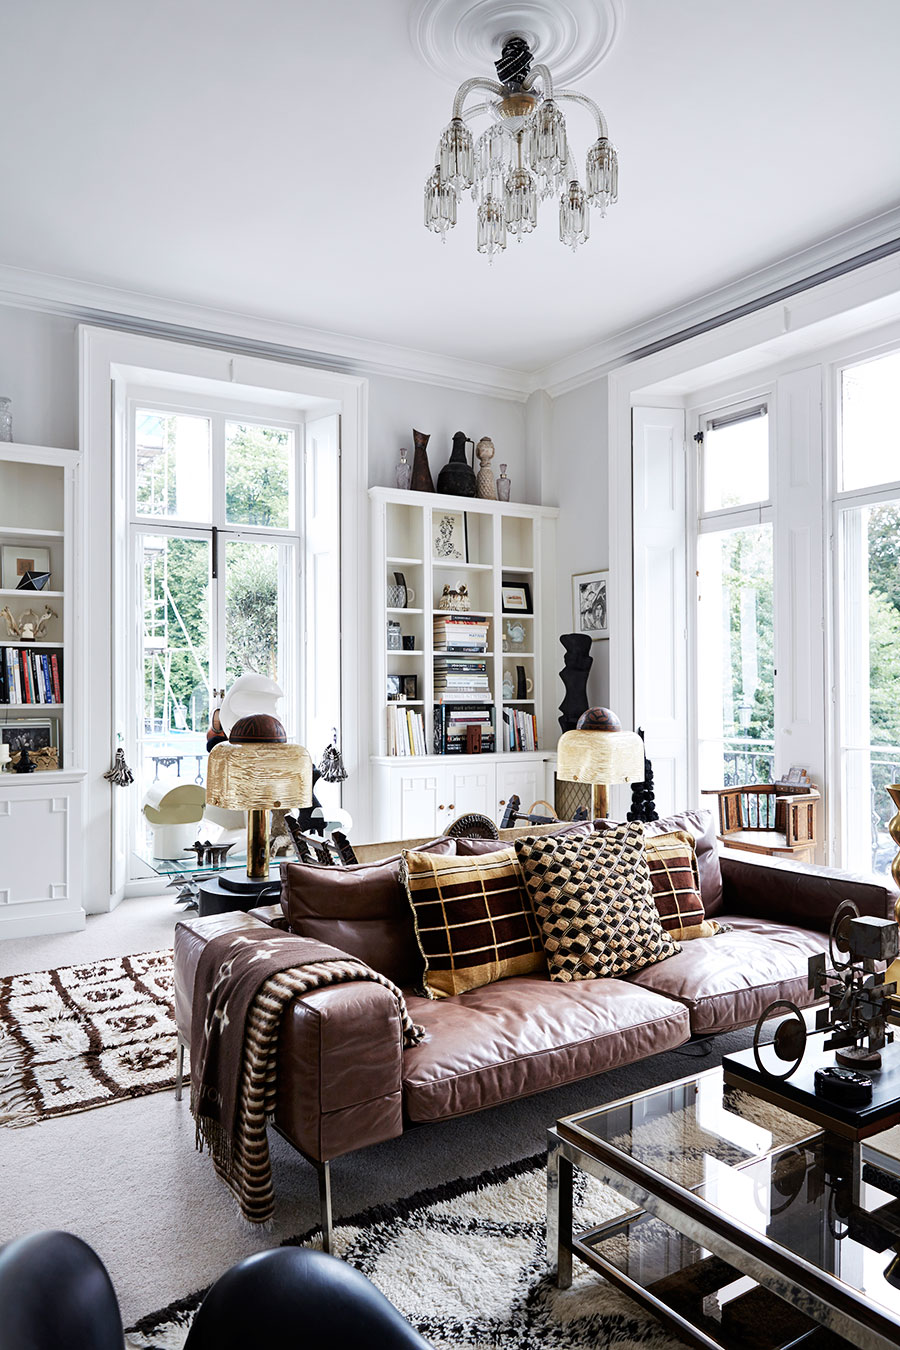 Bohemisk Lyx Hemma Hos Malene Birger Elle Decoration